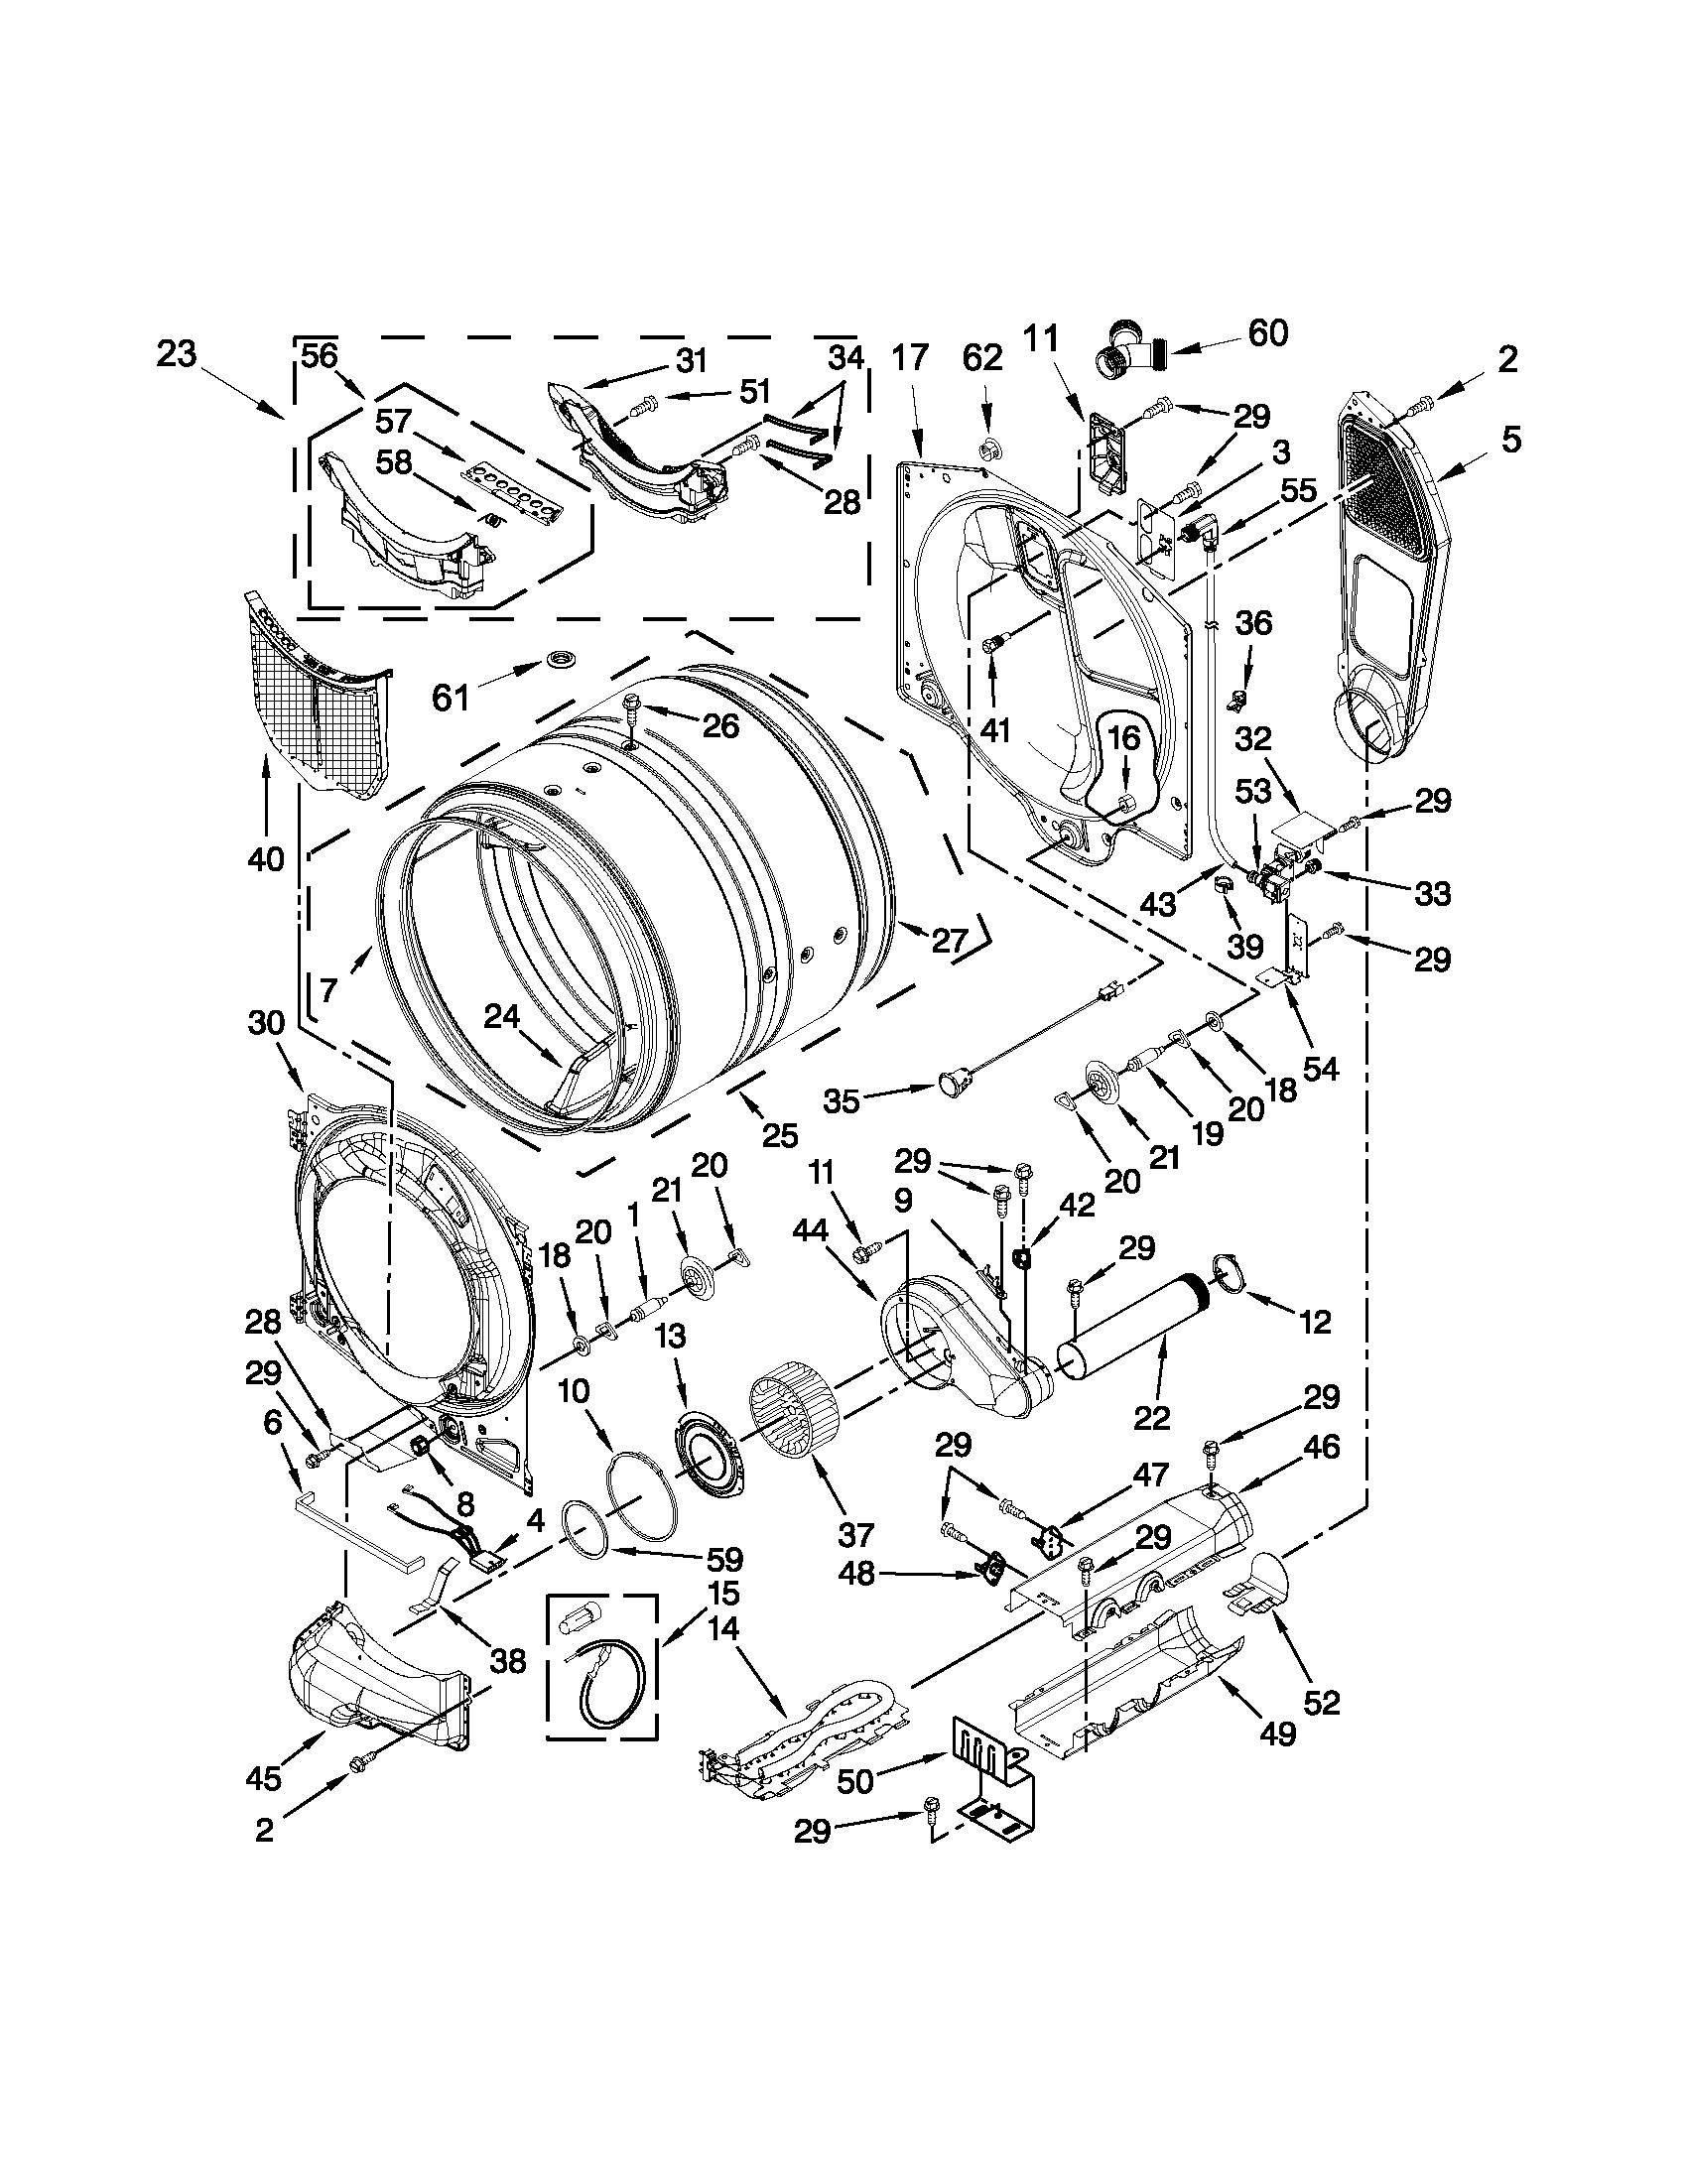 [NRIO_4796]   GL_3704] Maytag Dryer Wiring Diagram De 4 200 Free Diagram | Roper Rex5634kq2 Dryer 4 Prong Wiring Diagram |  | Frag Teria Unre Garna Mohammedshrine Librar Wiring 101